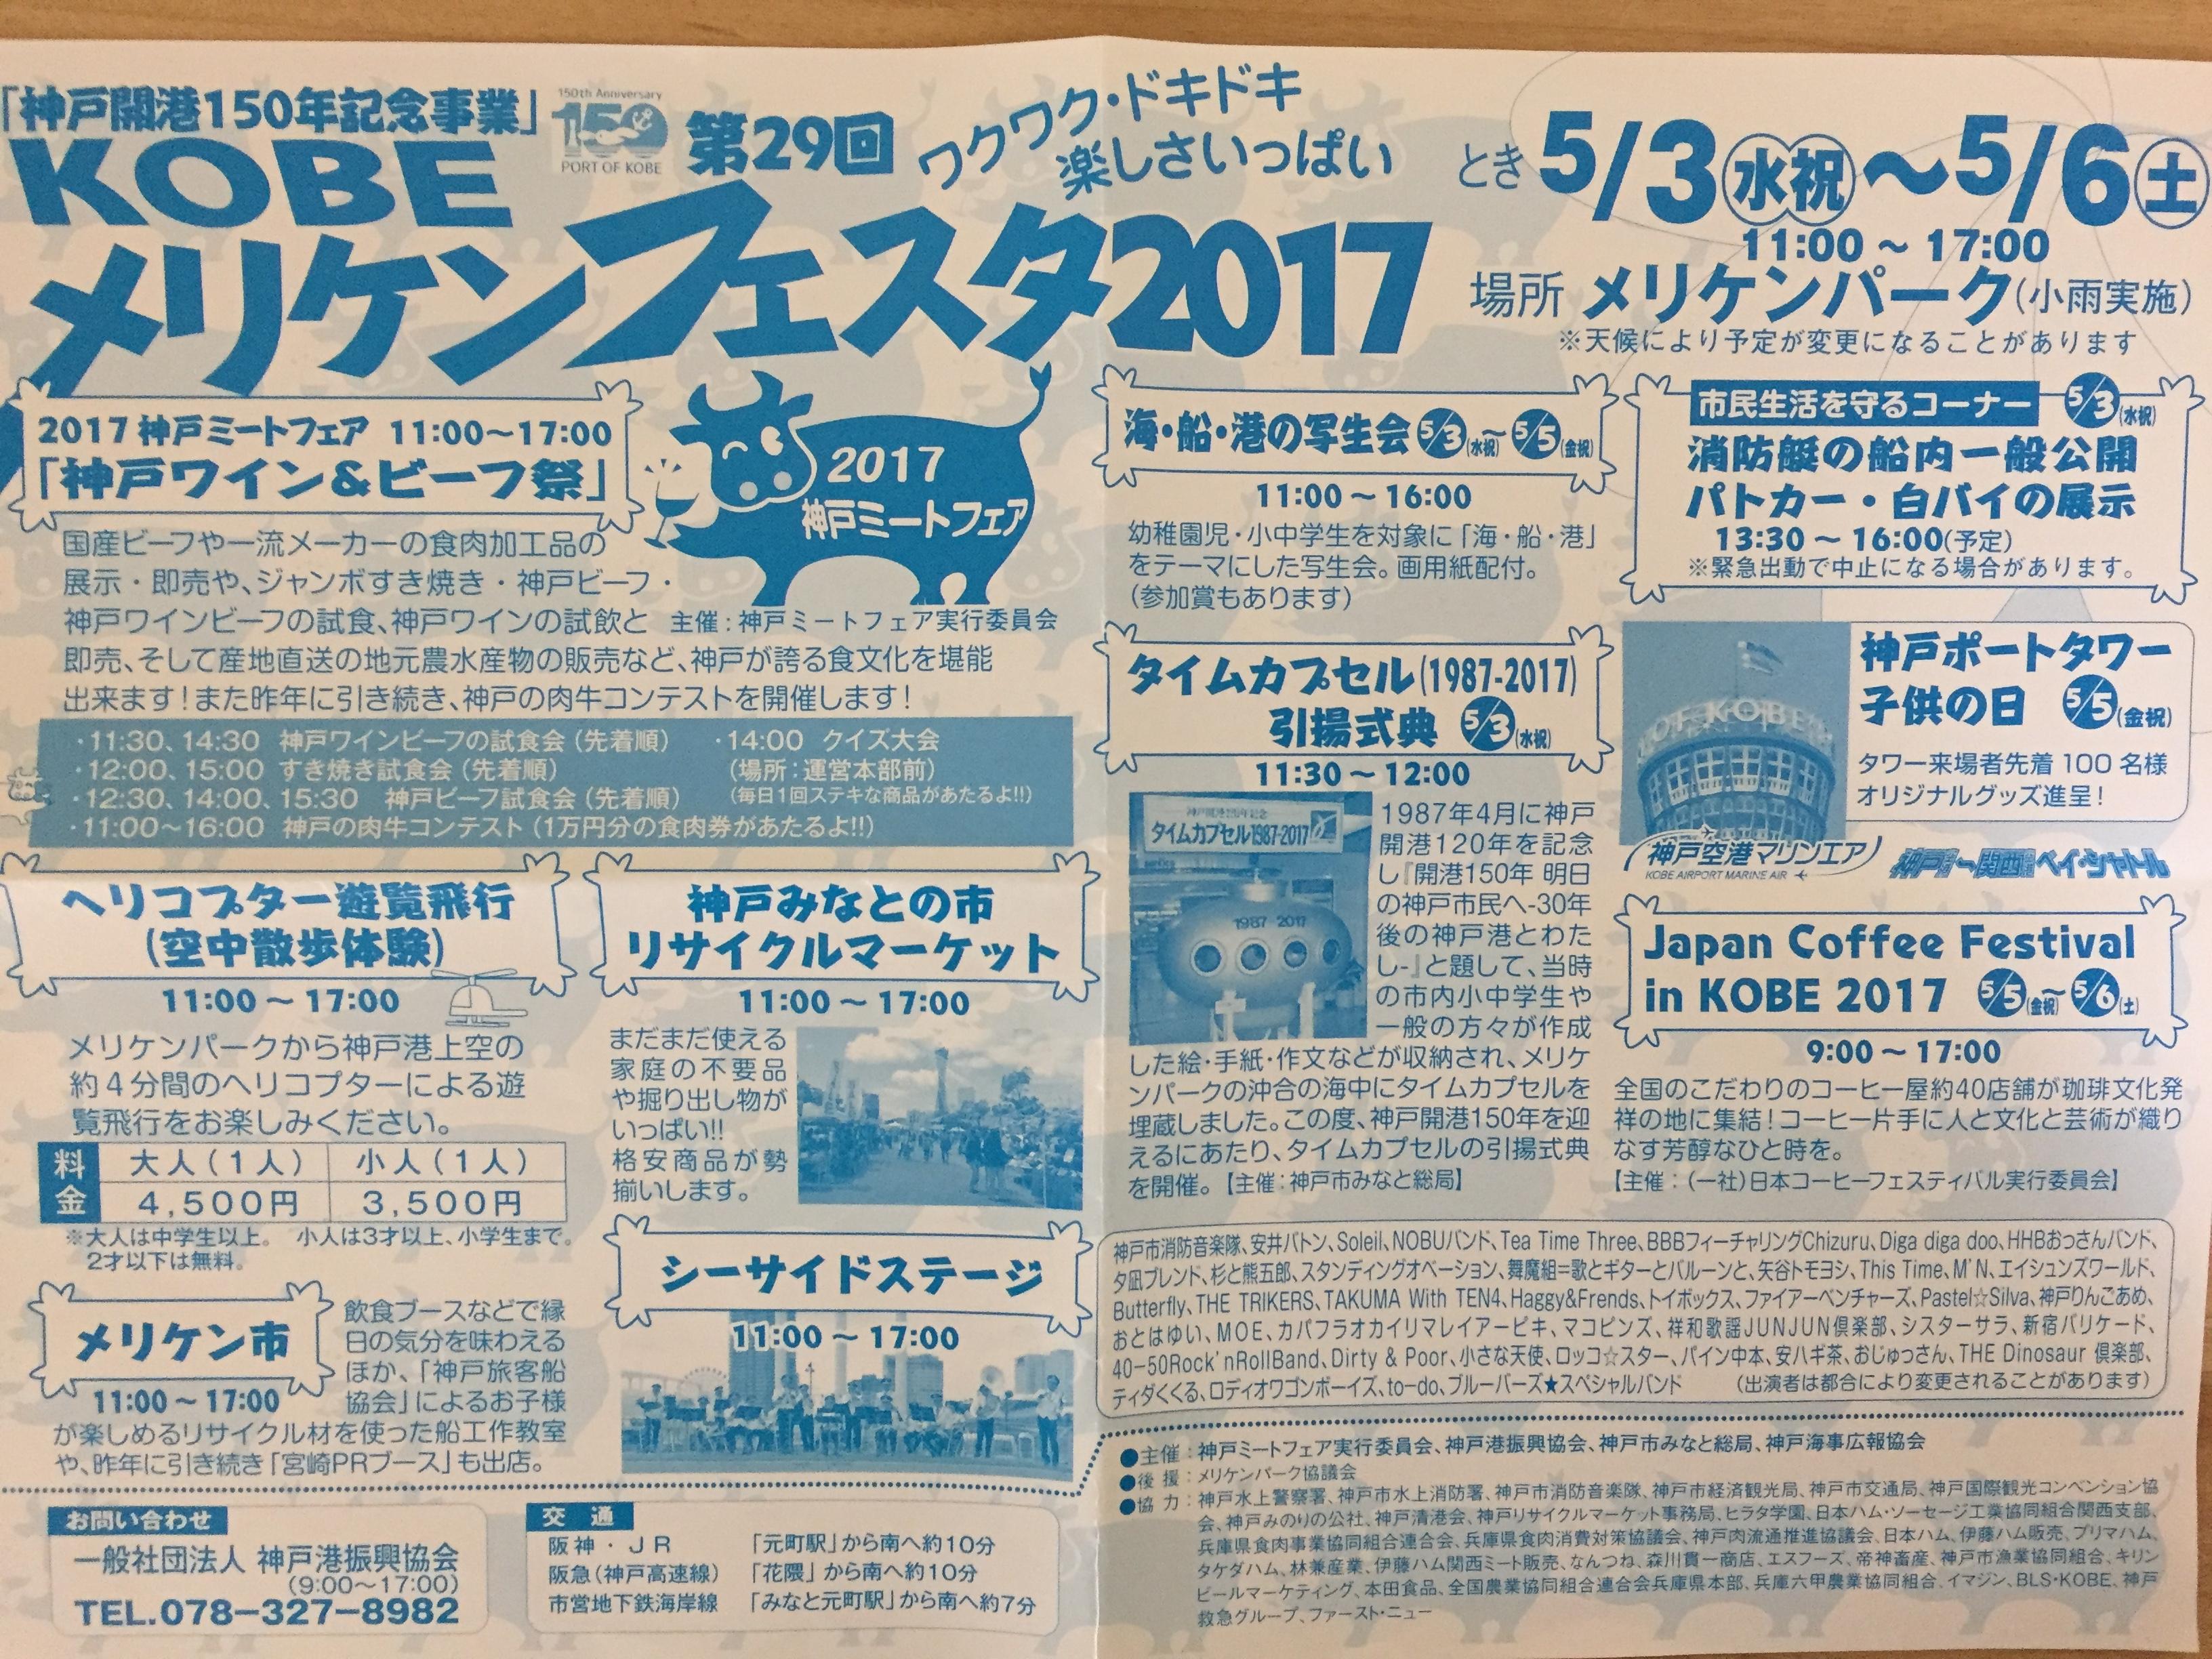 「KOBEメリケンフェスタ2017」が神戸メリケンパークで5/3~5/6に開催されるよ【イベント告知】